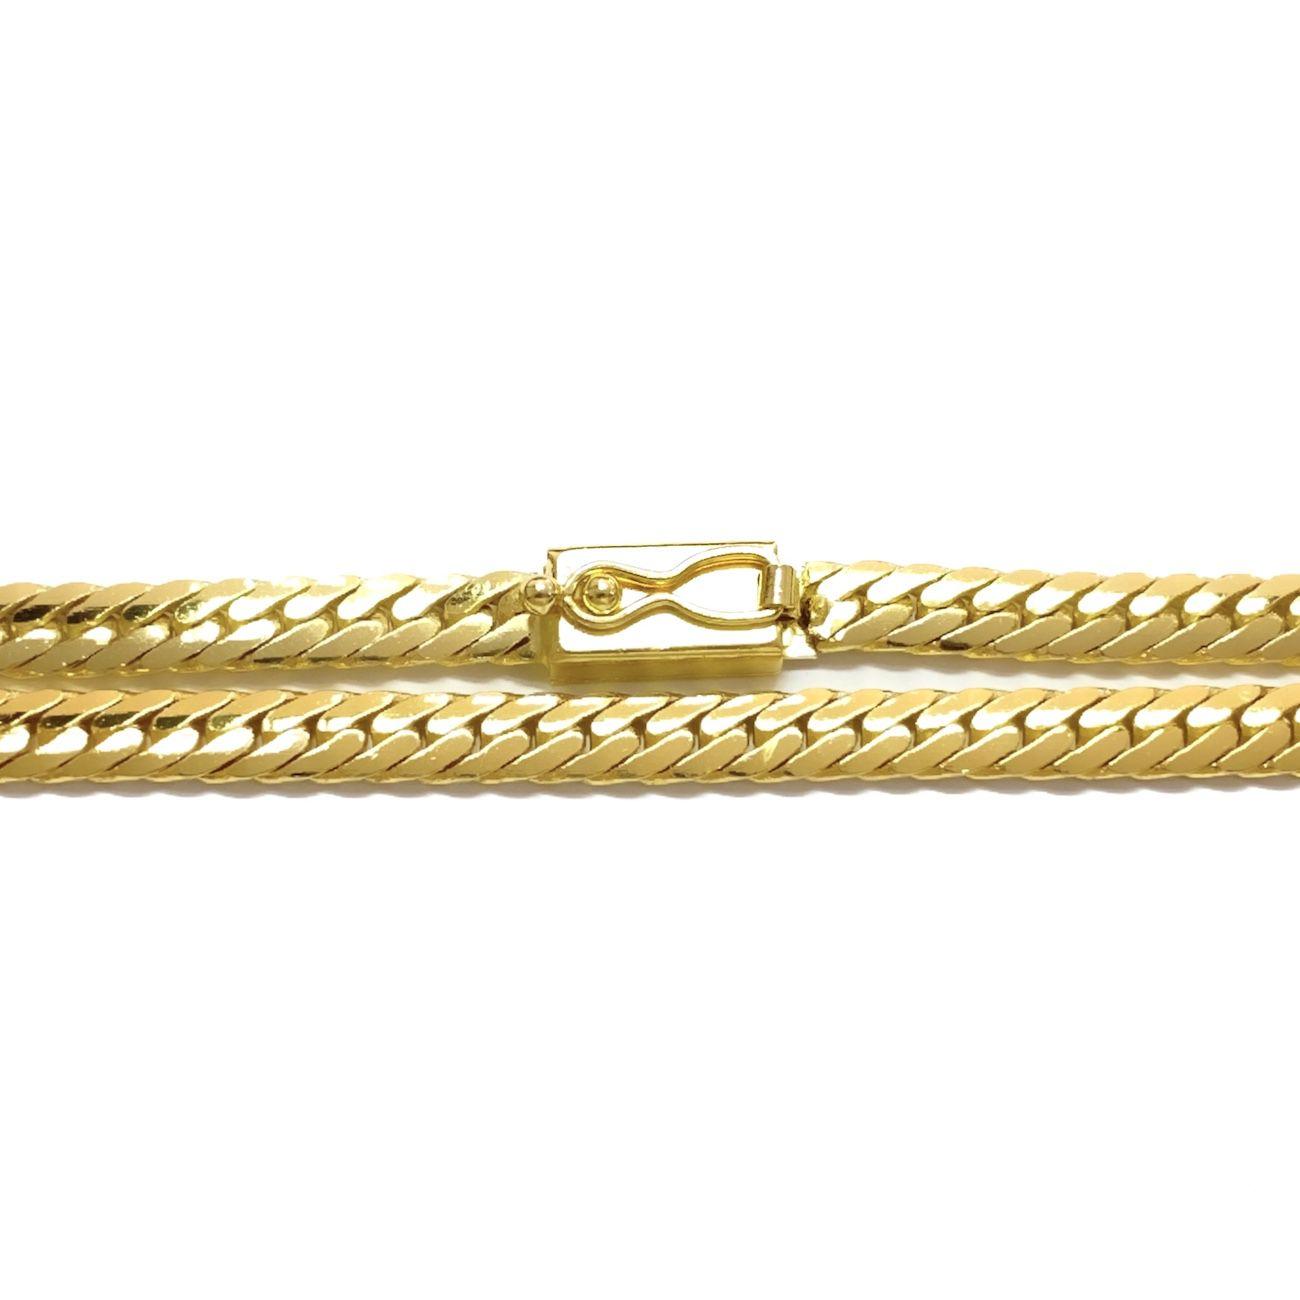 Corrente Lacraia 4,5mm 70cm (34g) (Fecho gaveta) (Banho Ouro 24k)